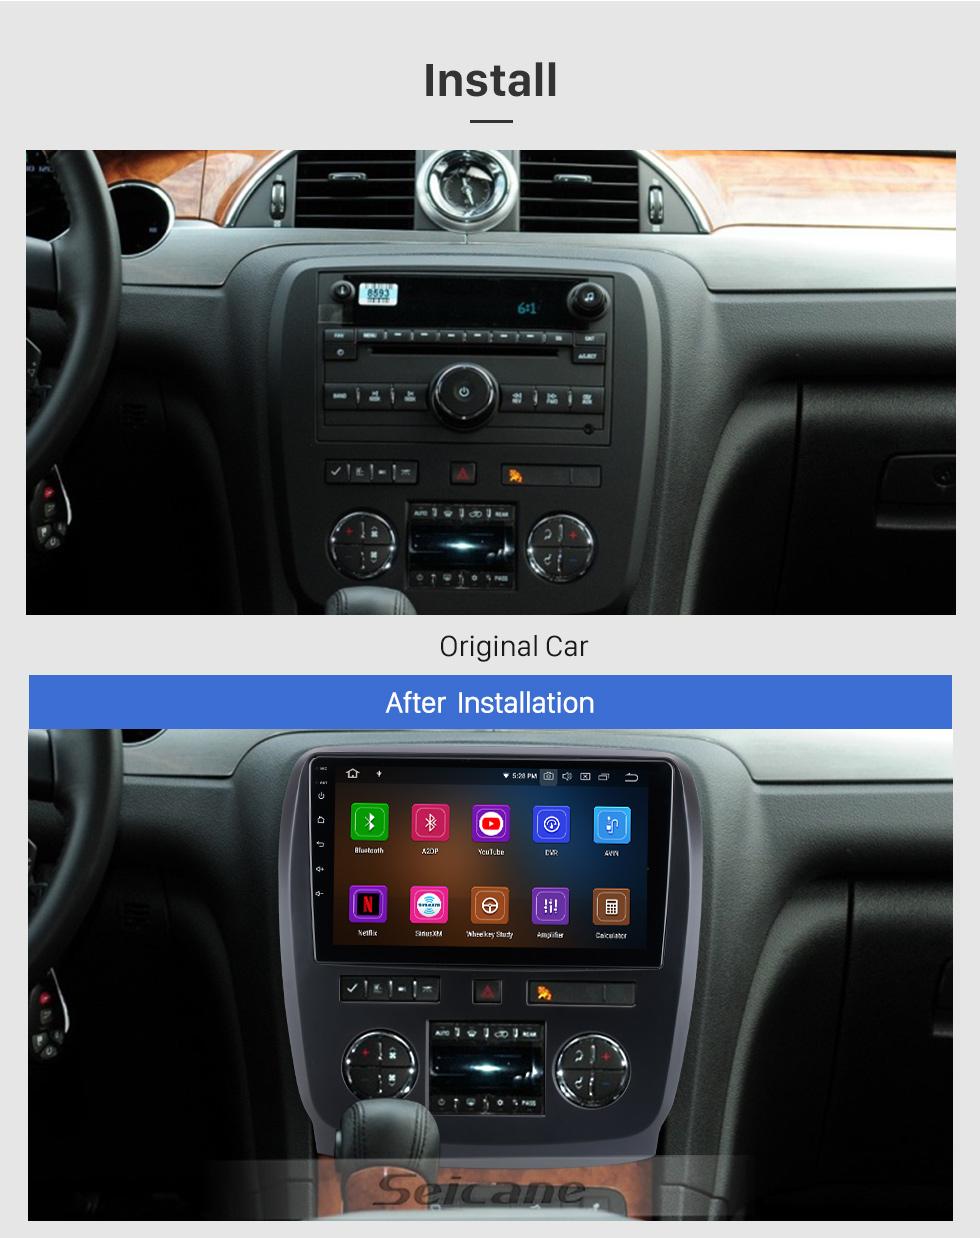 Seicane Android 10.0 Für 2018 Honda Elysion Radio 9-Zoll-GPS-Navigationssystem Bluetooth HD Touchscreen Carplay-Unterstützung Rückfahrkamera